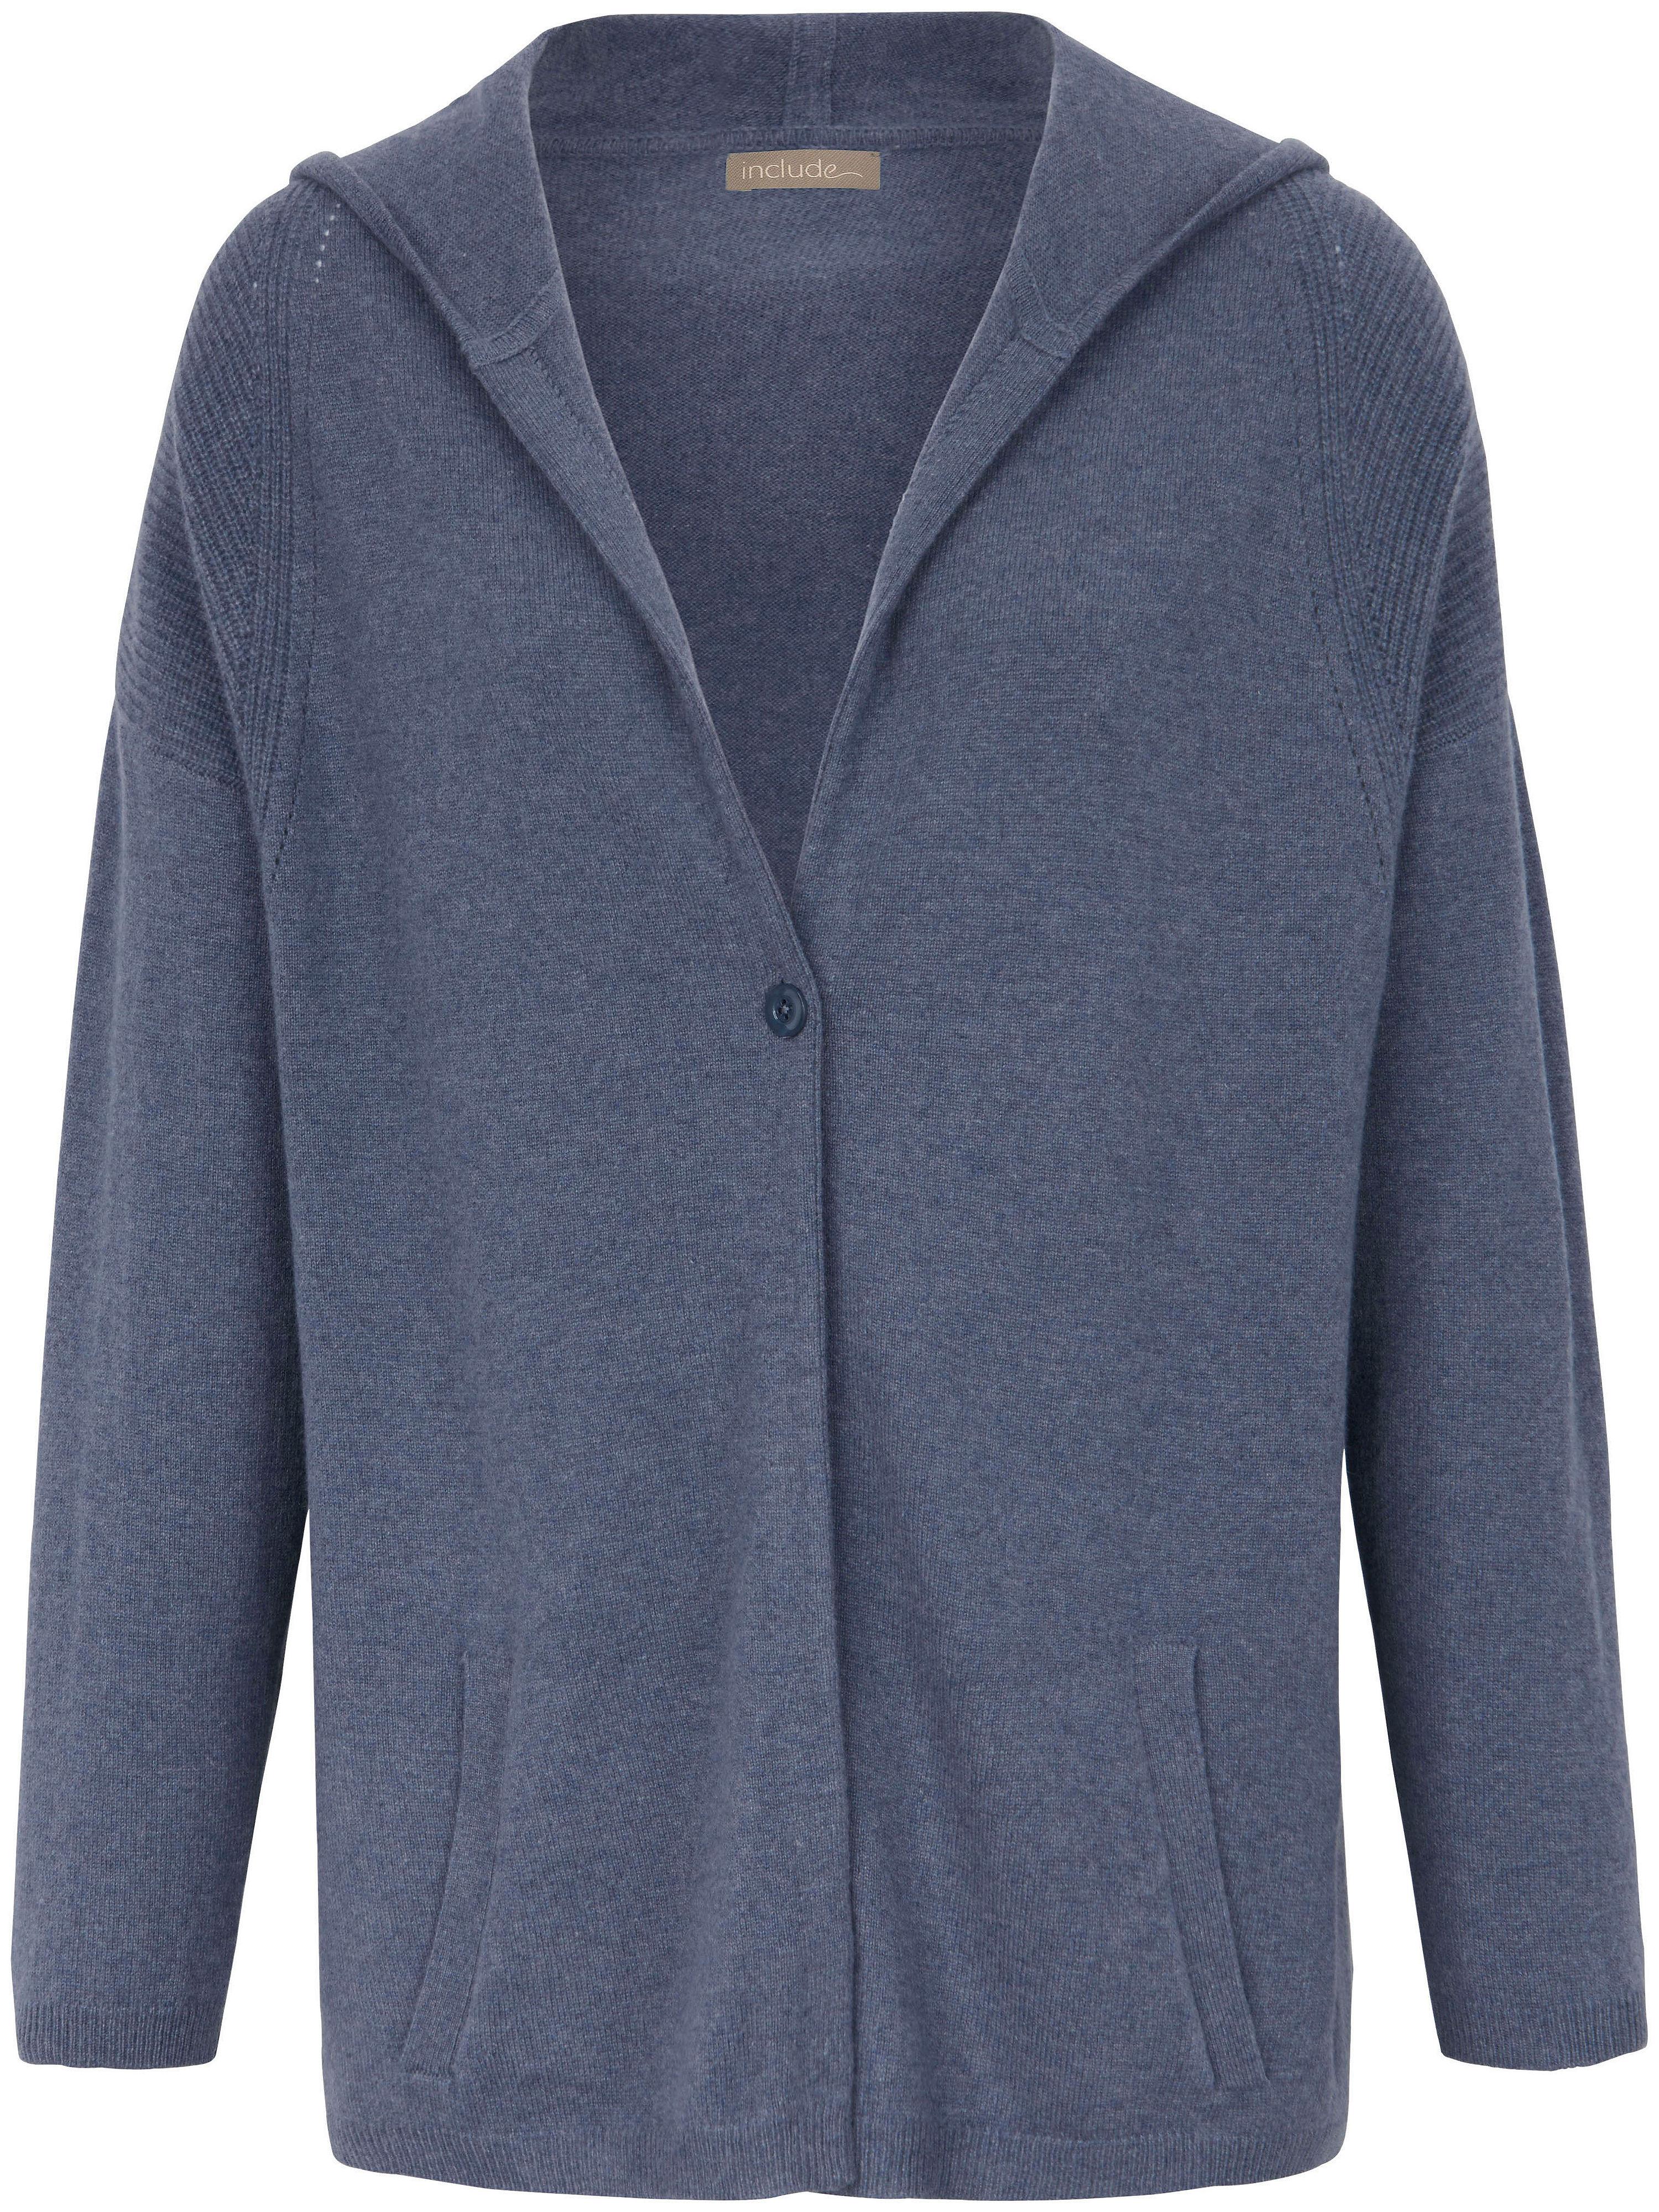 Strickjacke aus 100% Kaschmir include blau | Bekleidung > Strickjacken & -mäntel | Denim | include